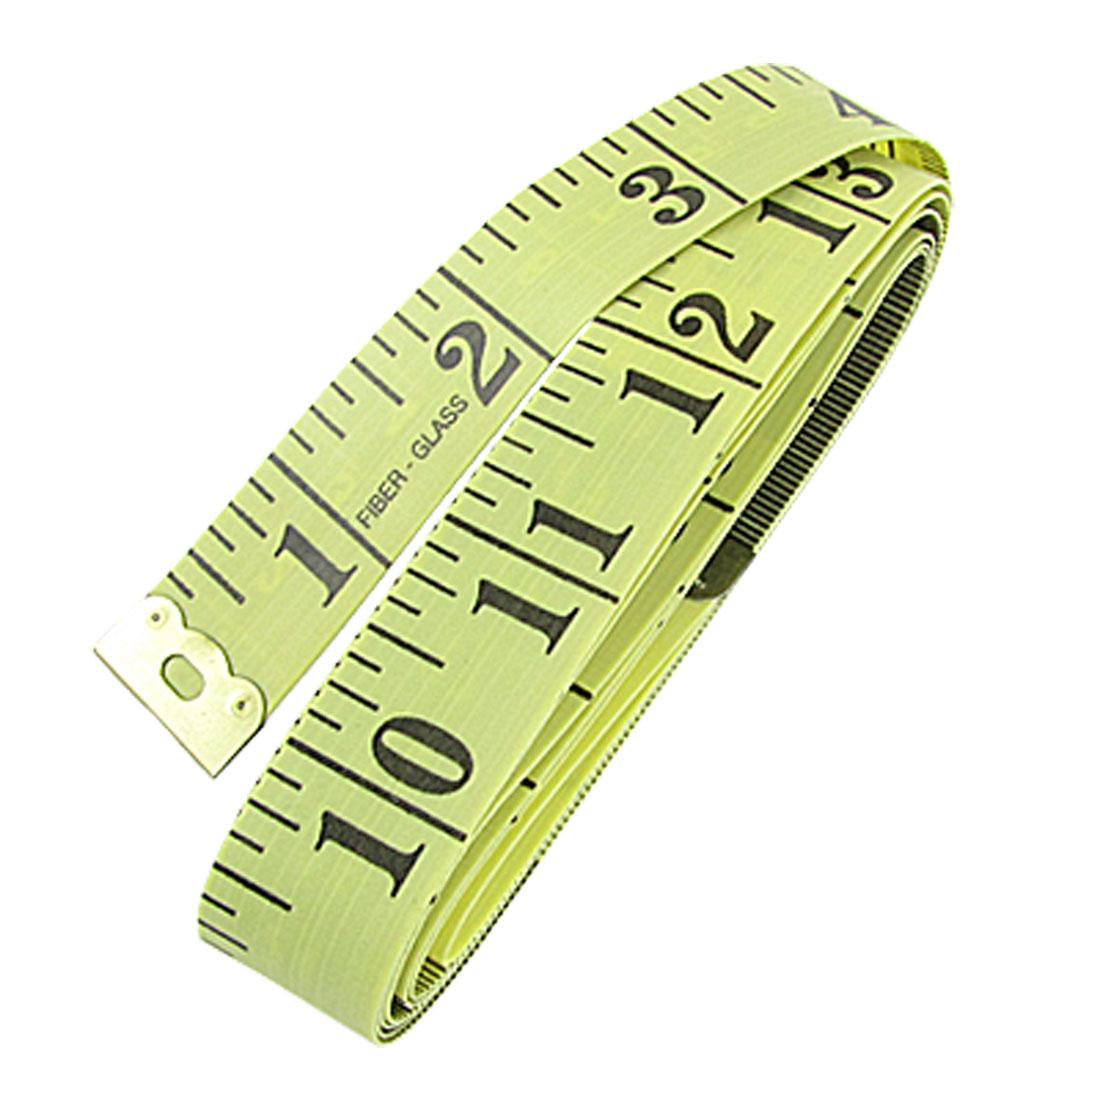 Tape Measure Clip Art - Cliparts.co